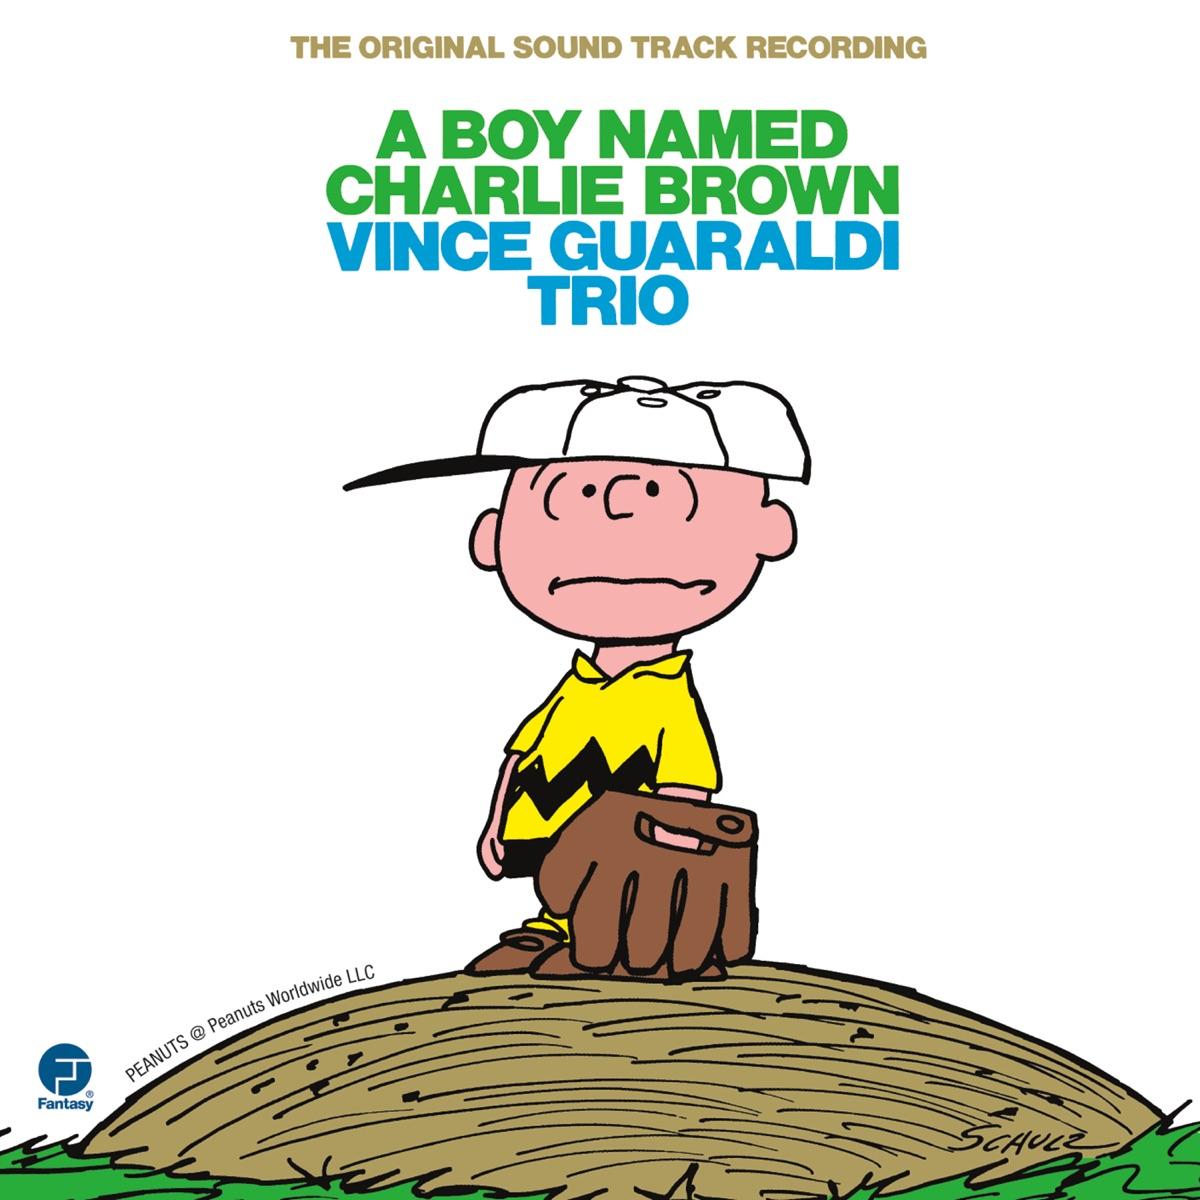 A Boy Named Charlie Brown The Original Soundtrack Recording Vince Guaraldi Trio CD cover